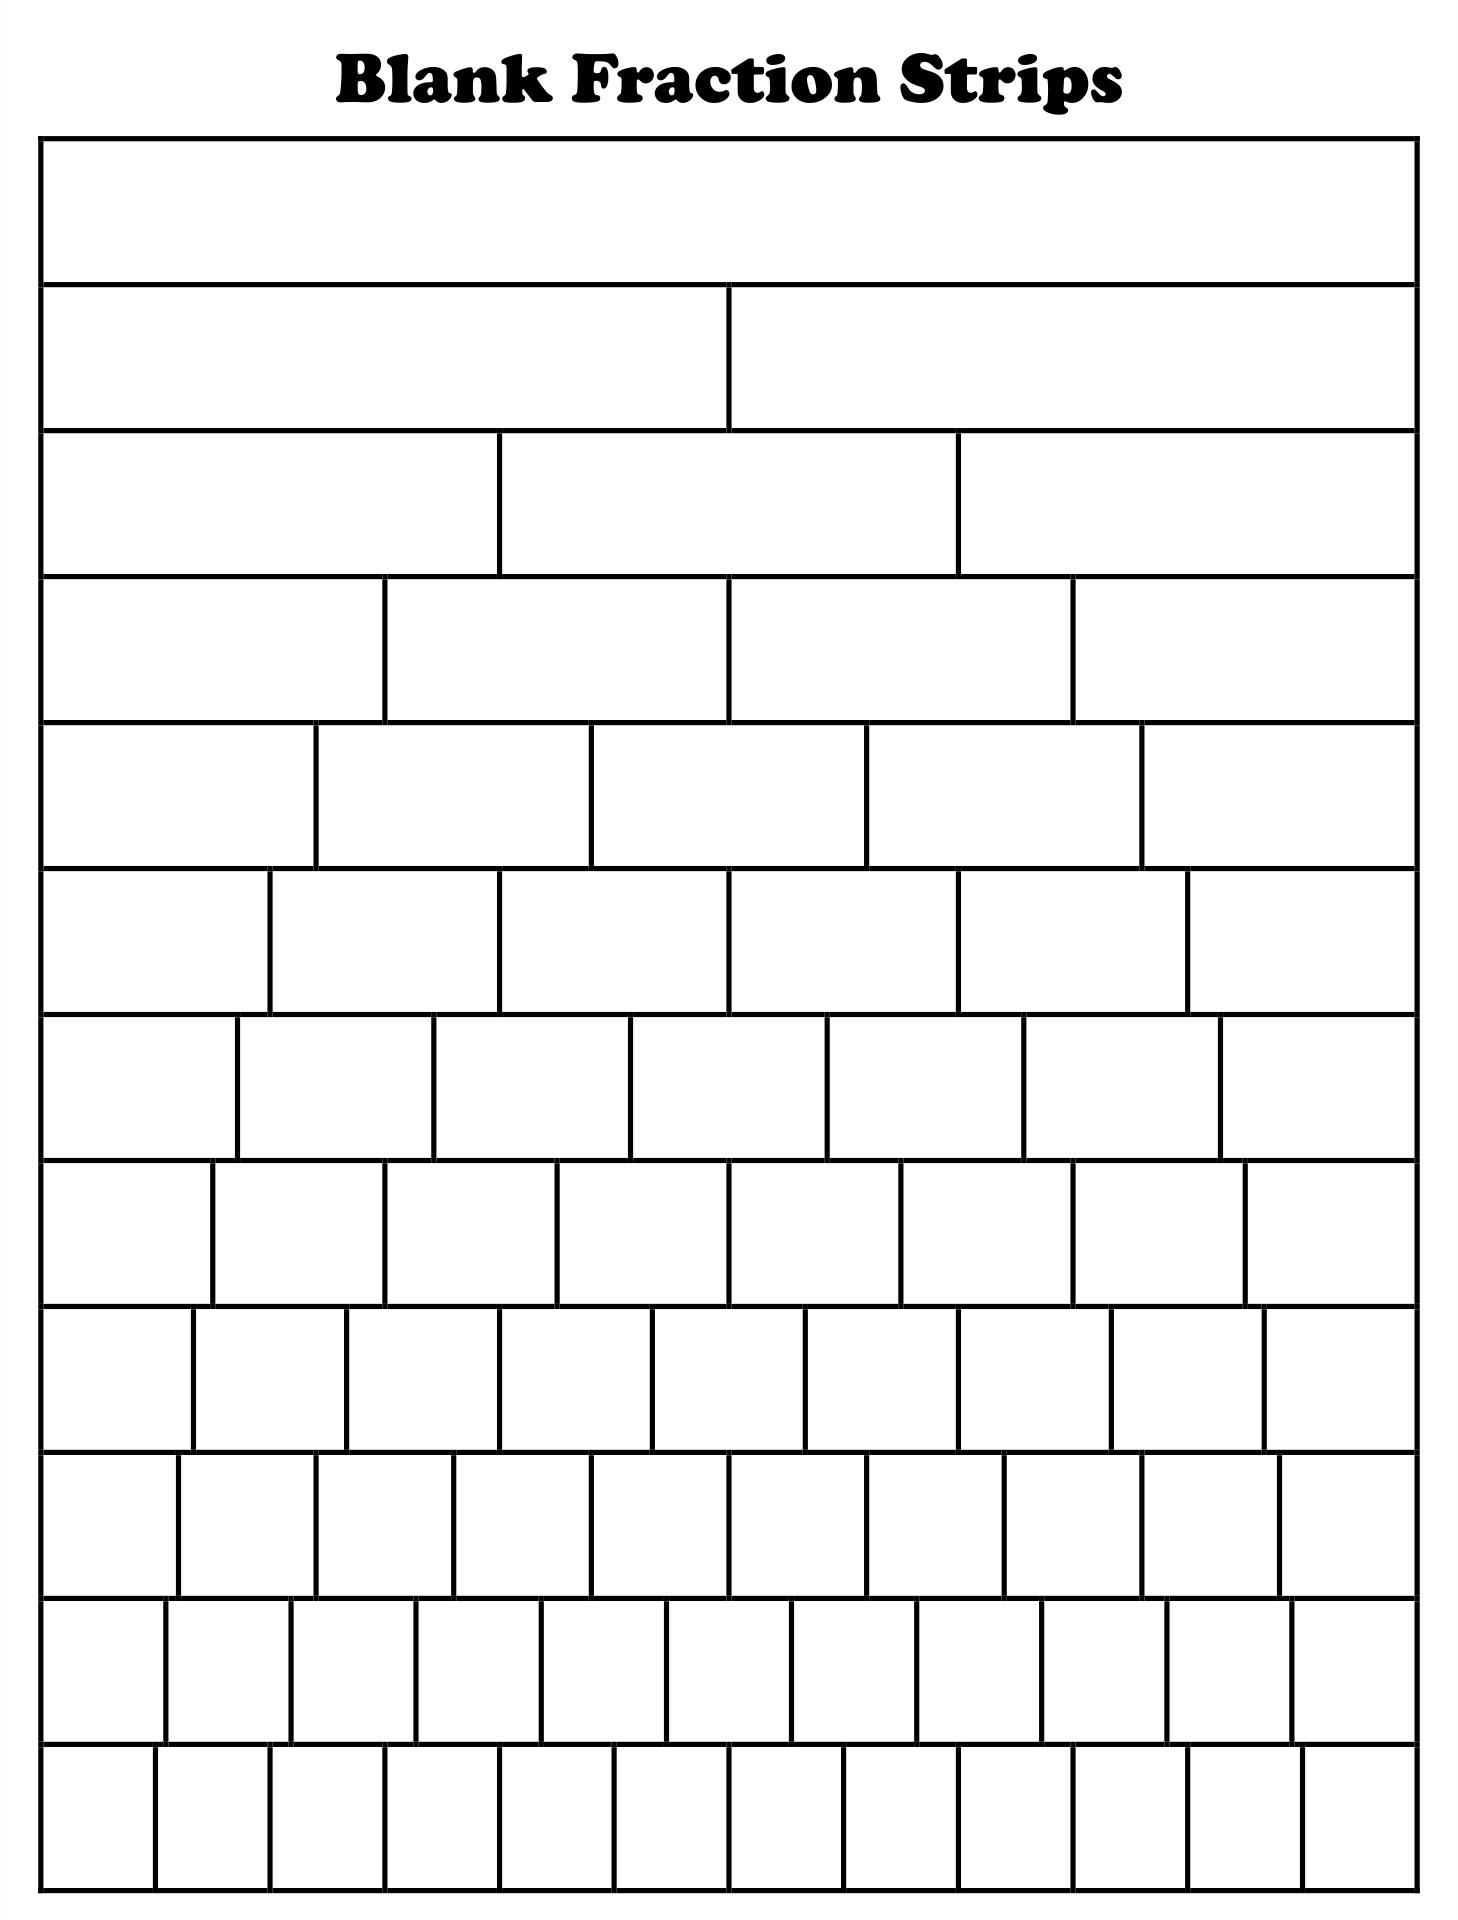 Blank Fraction Strips Printable